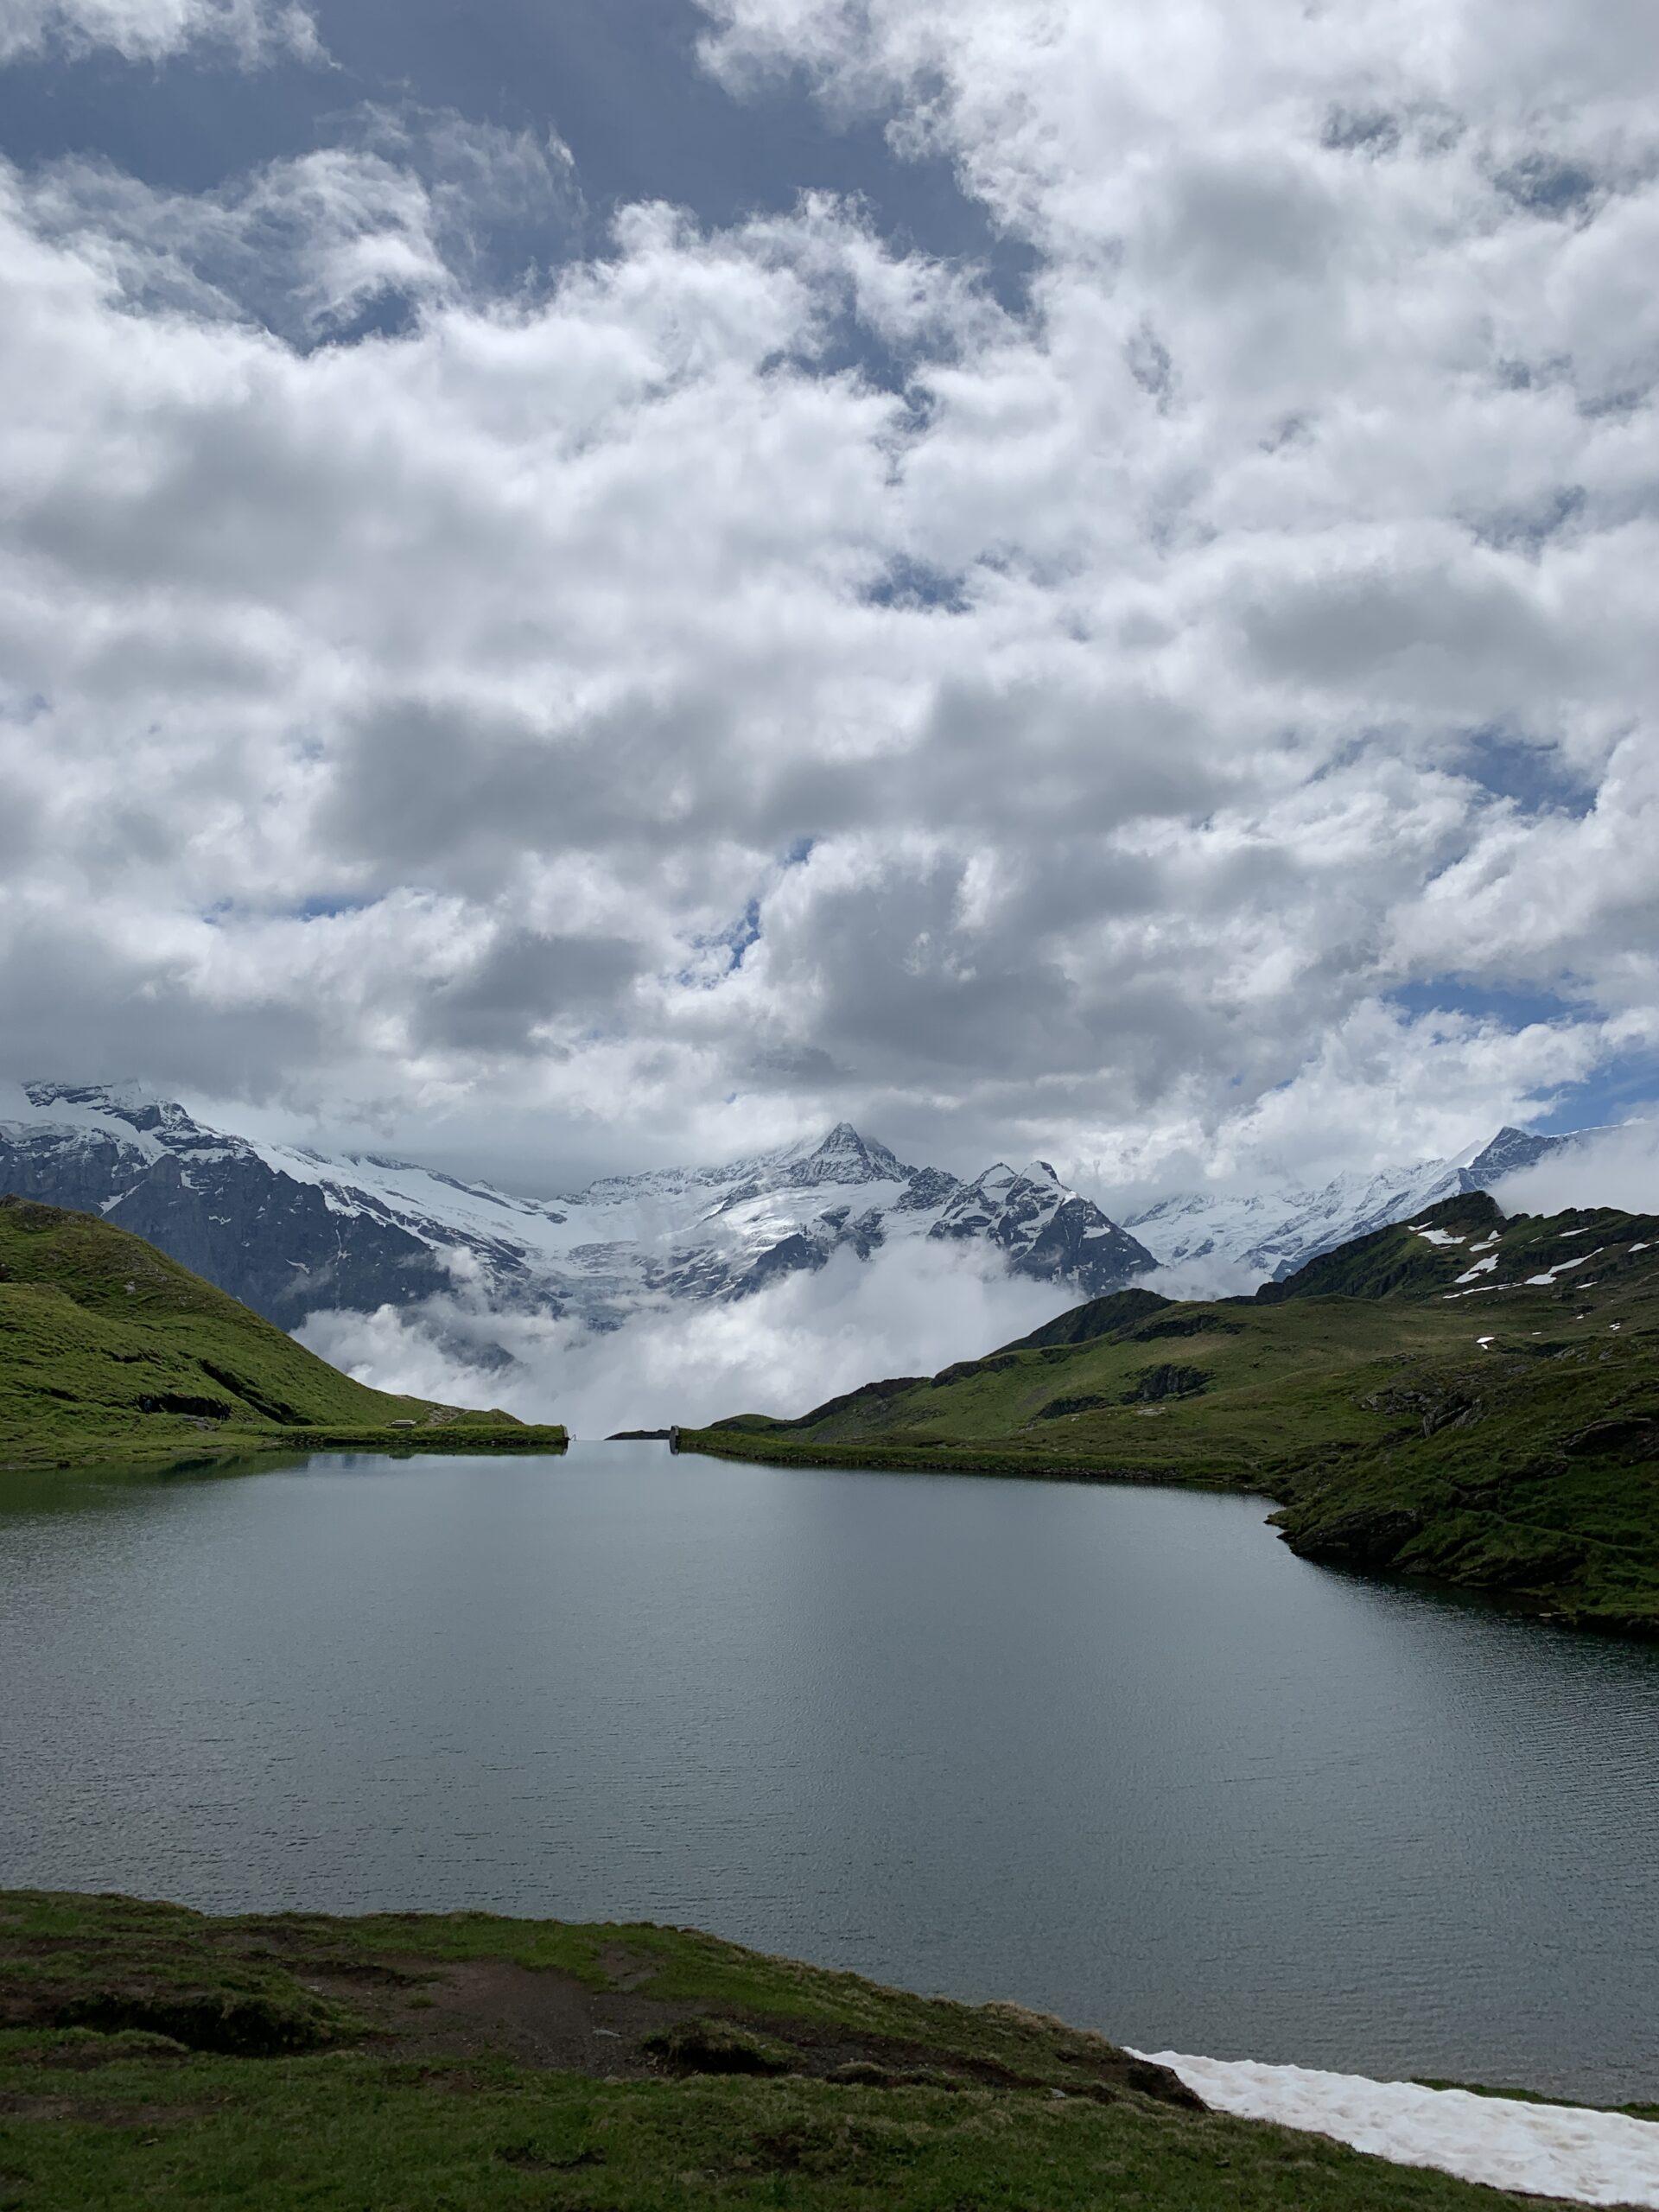 Procap Wanderung mit Mountain4Life in Grindelwald